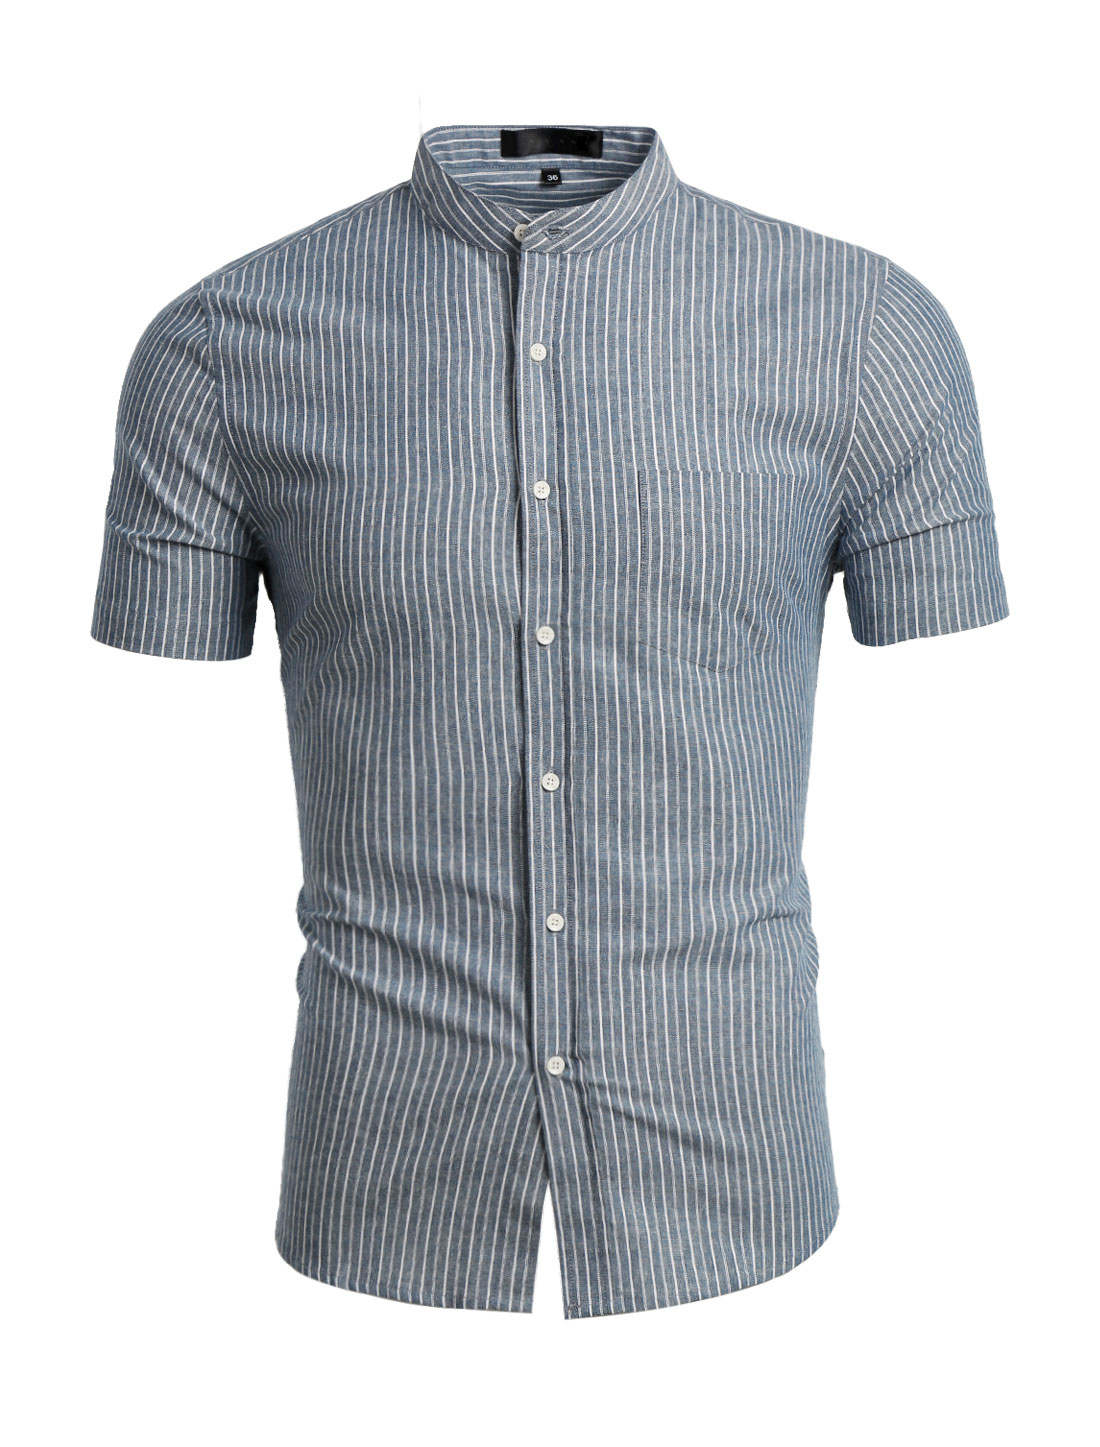 Men Banded Collar Short Sleeves Stripes Pattern Shirt Gray M